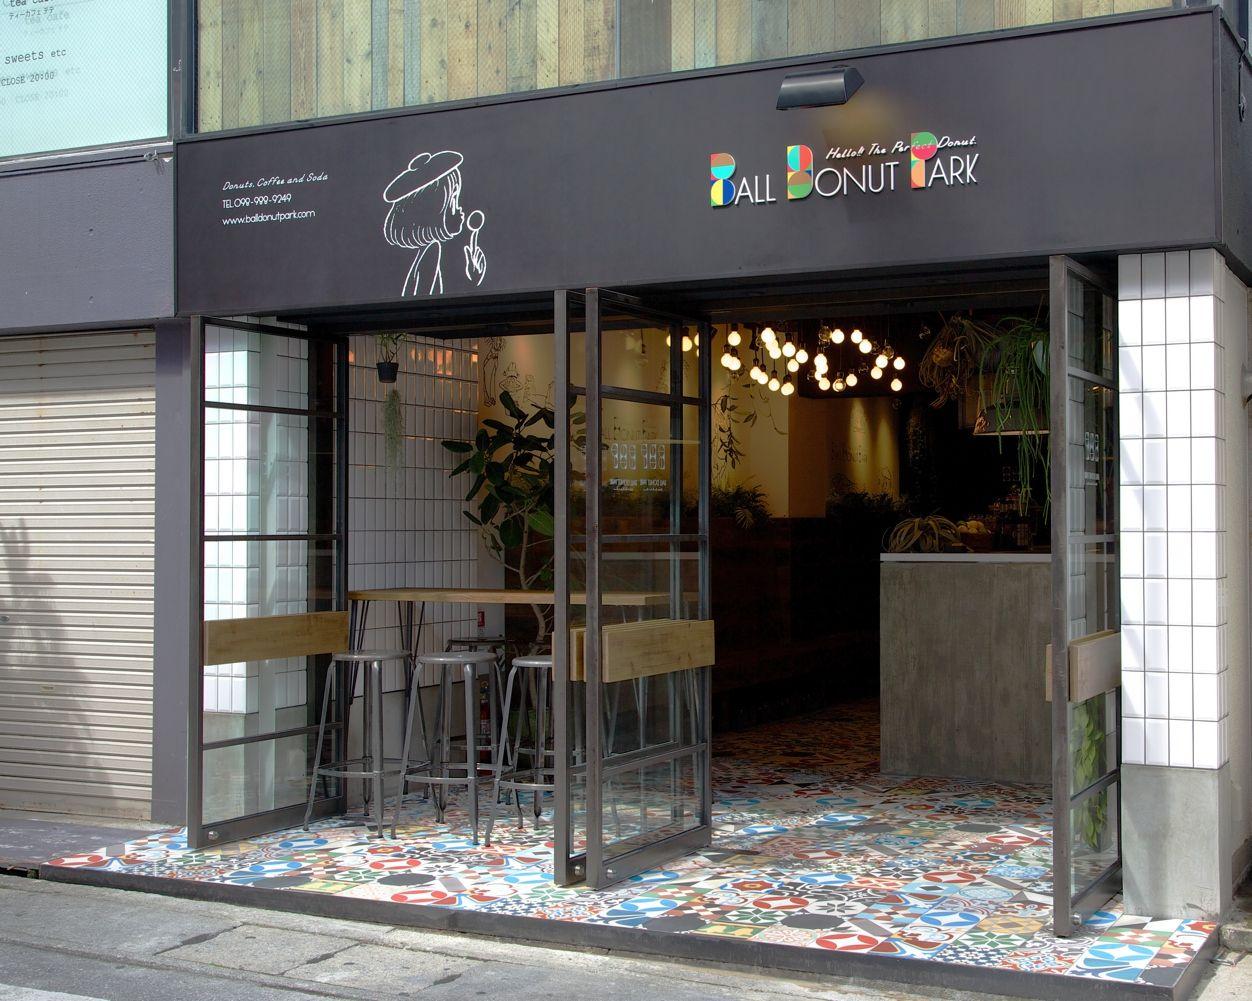 BALL DONUT PARK in OKINAWA JAPAN. 2014.08.28 FANTASTIC OPEN! http://www.balldonutpark.com/ ■Branding direction / Takeshi Umeda & Tatsuya Kasai by that's all light http://www.thatsallright.jp/  ■Interier design / Shoichiro Muroya & Inoue Marie by zycc corporation http://www.zycc.co.jp/#2  ■Illustration / Tamukun